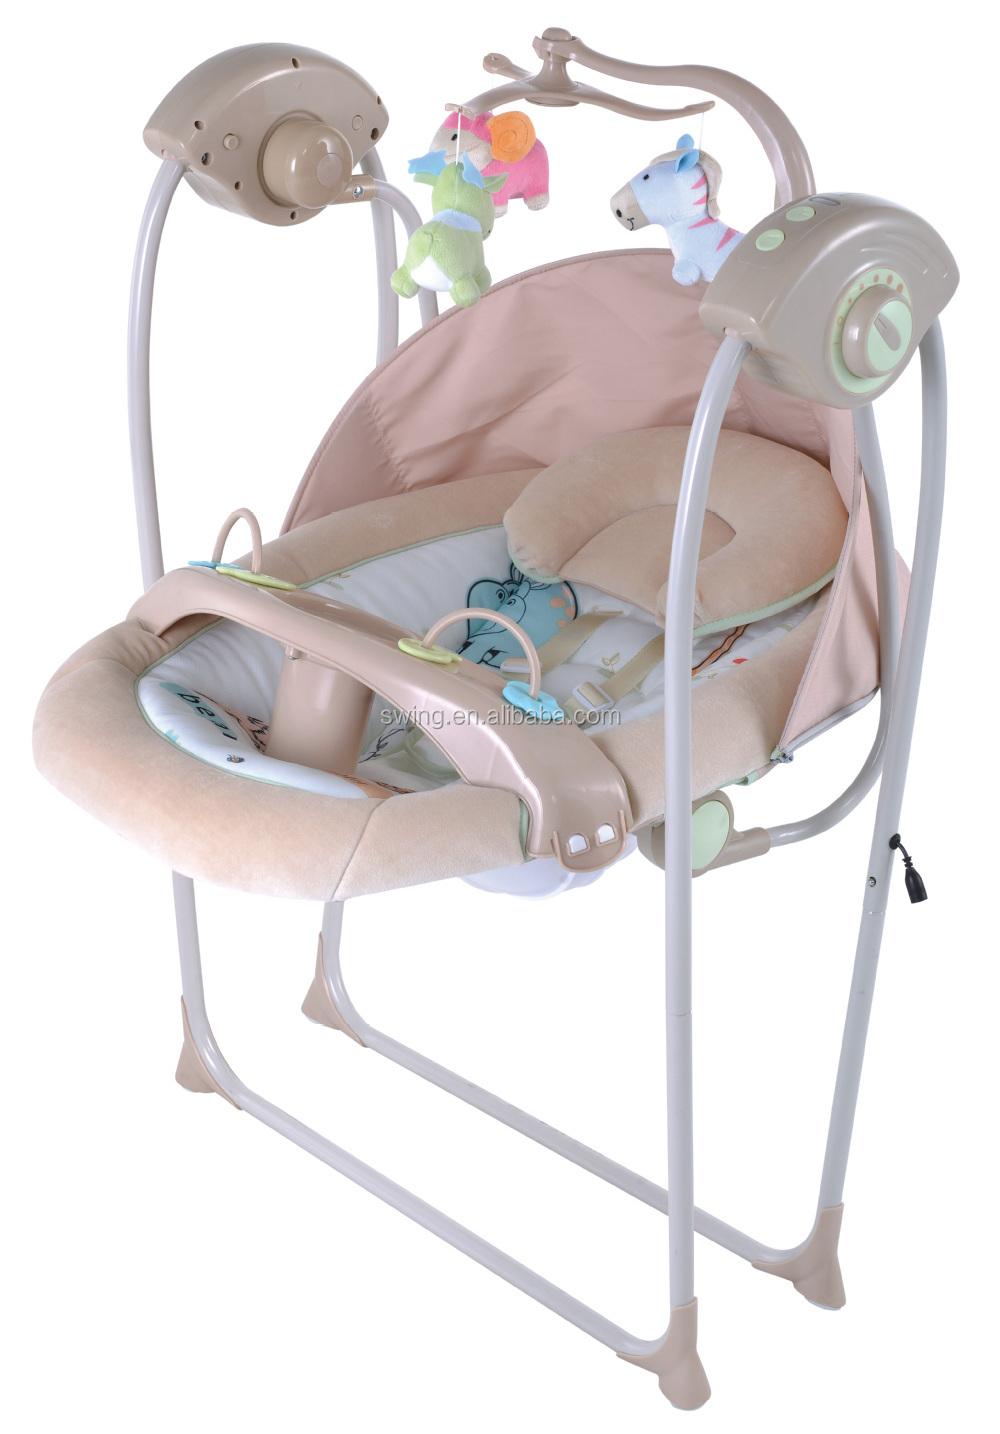 Babybed swing/elektrische babybett/columpios pará bebes, plastic ...